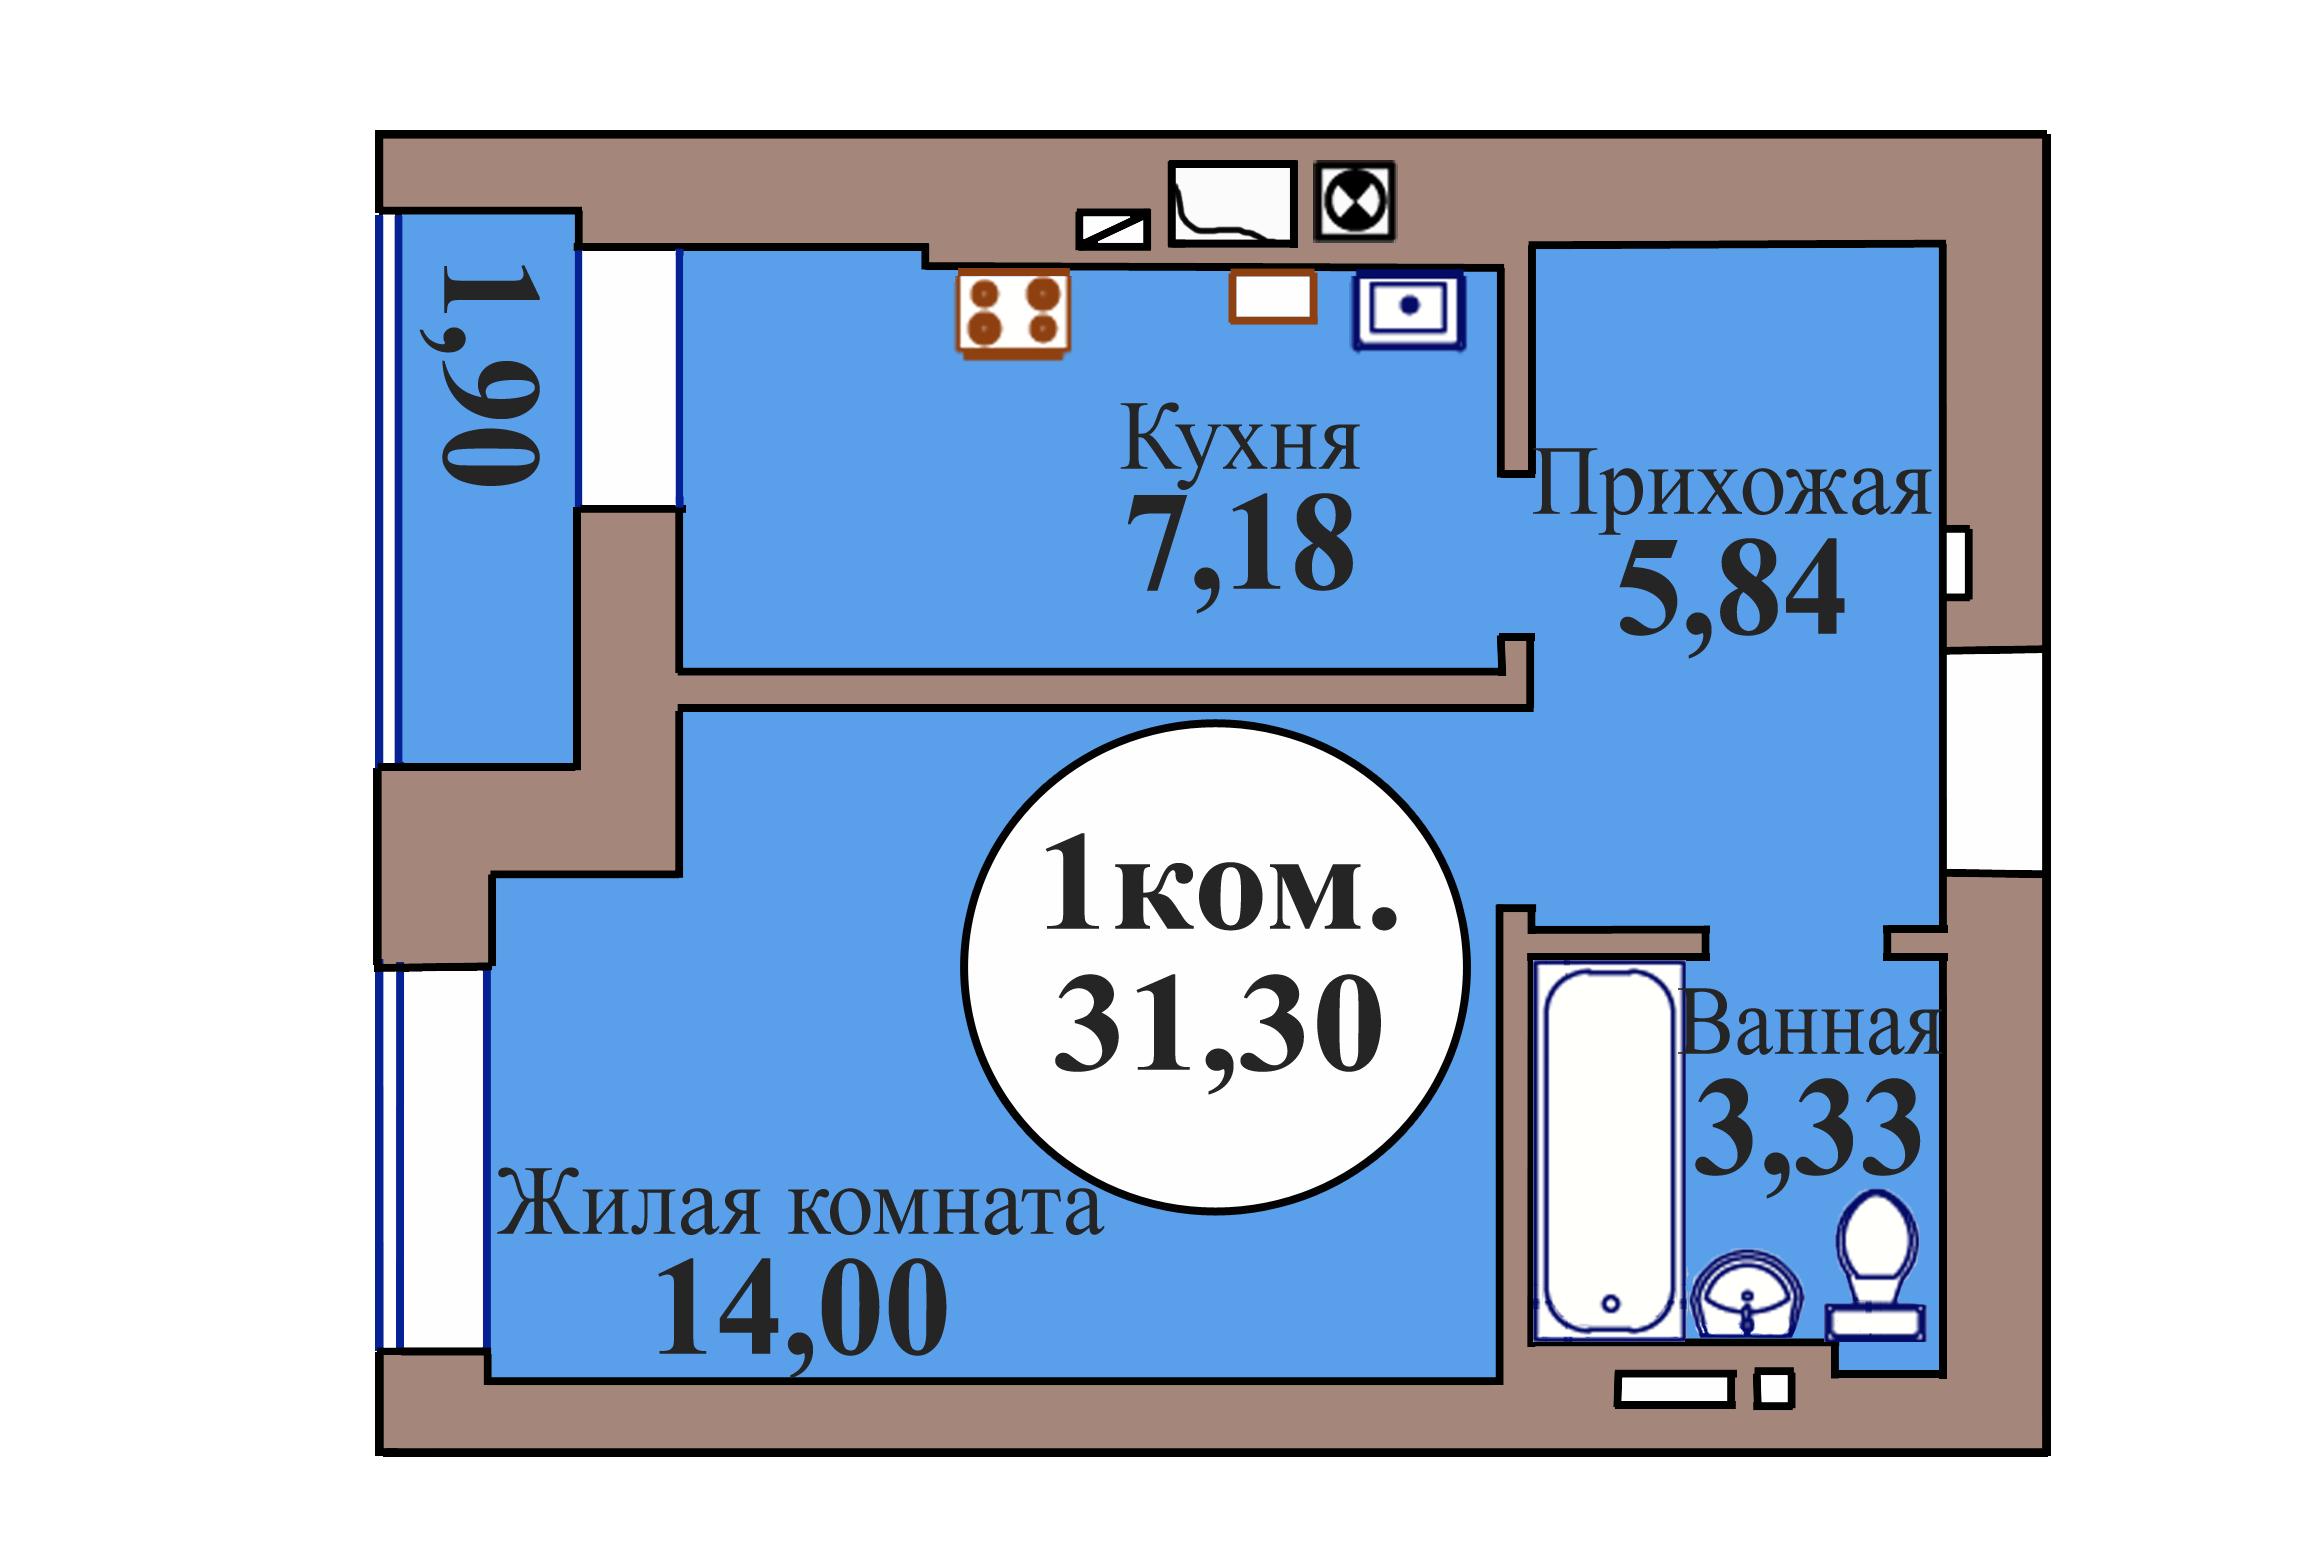 1-комн. кв. по пер. Калининградский, 5 кв. 36 в Калининграде